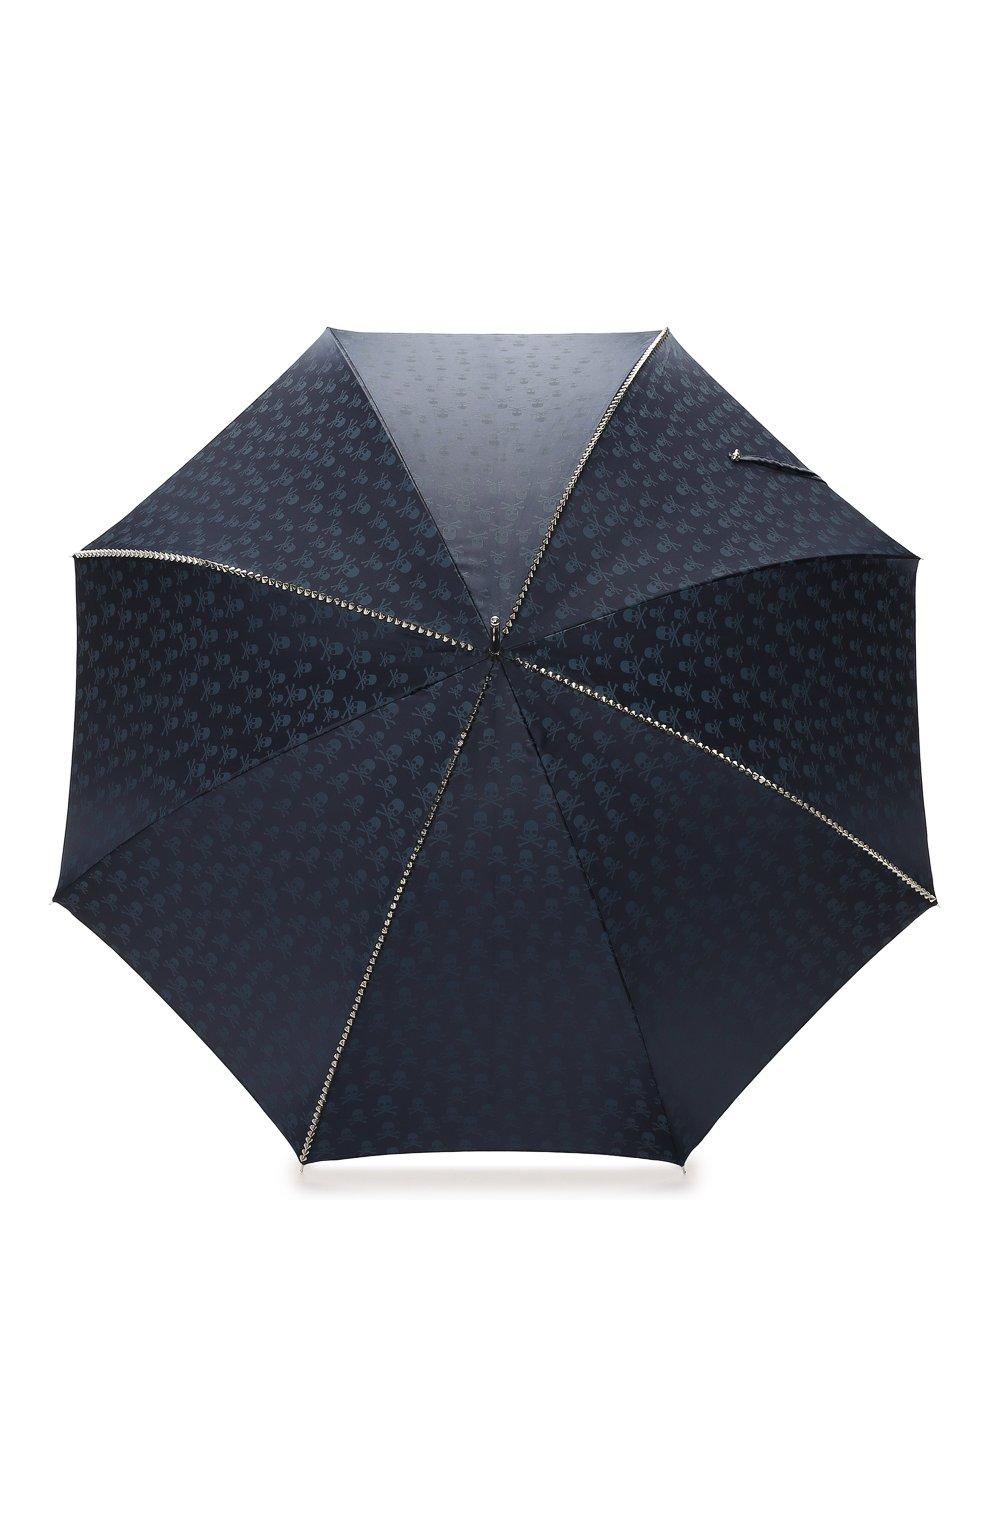 Мужской зонт-трость PASOTTI OMBRELLI темно-синего цвета, арт. 416N/PLAT. BLU+TESCHI/W33 | Фото 1 (Материал: Текстиль, Синтетический материал, Металл; Статус проверки: Проверено, Проверена категория)